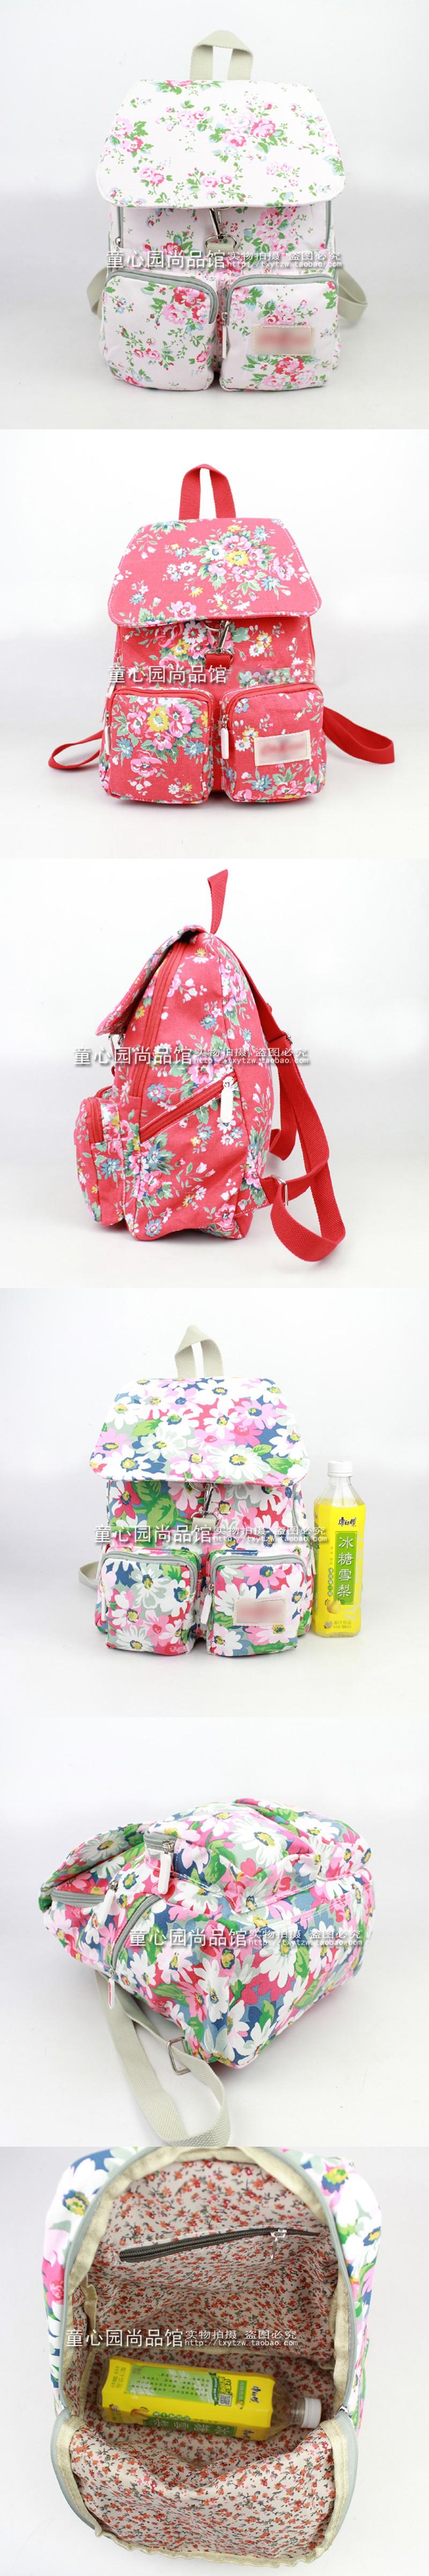 Children School Bags floral Printing Backpacks Canvas Bag Boys Gilrs Mochilas infantil School Kids schoolbag hiking backpack